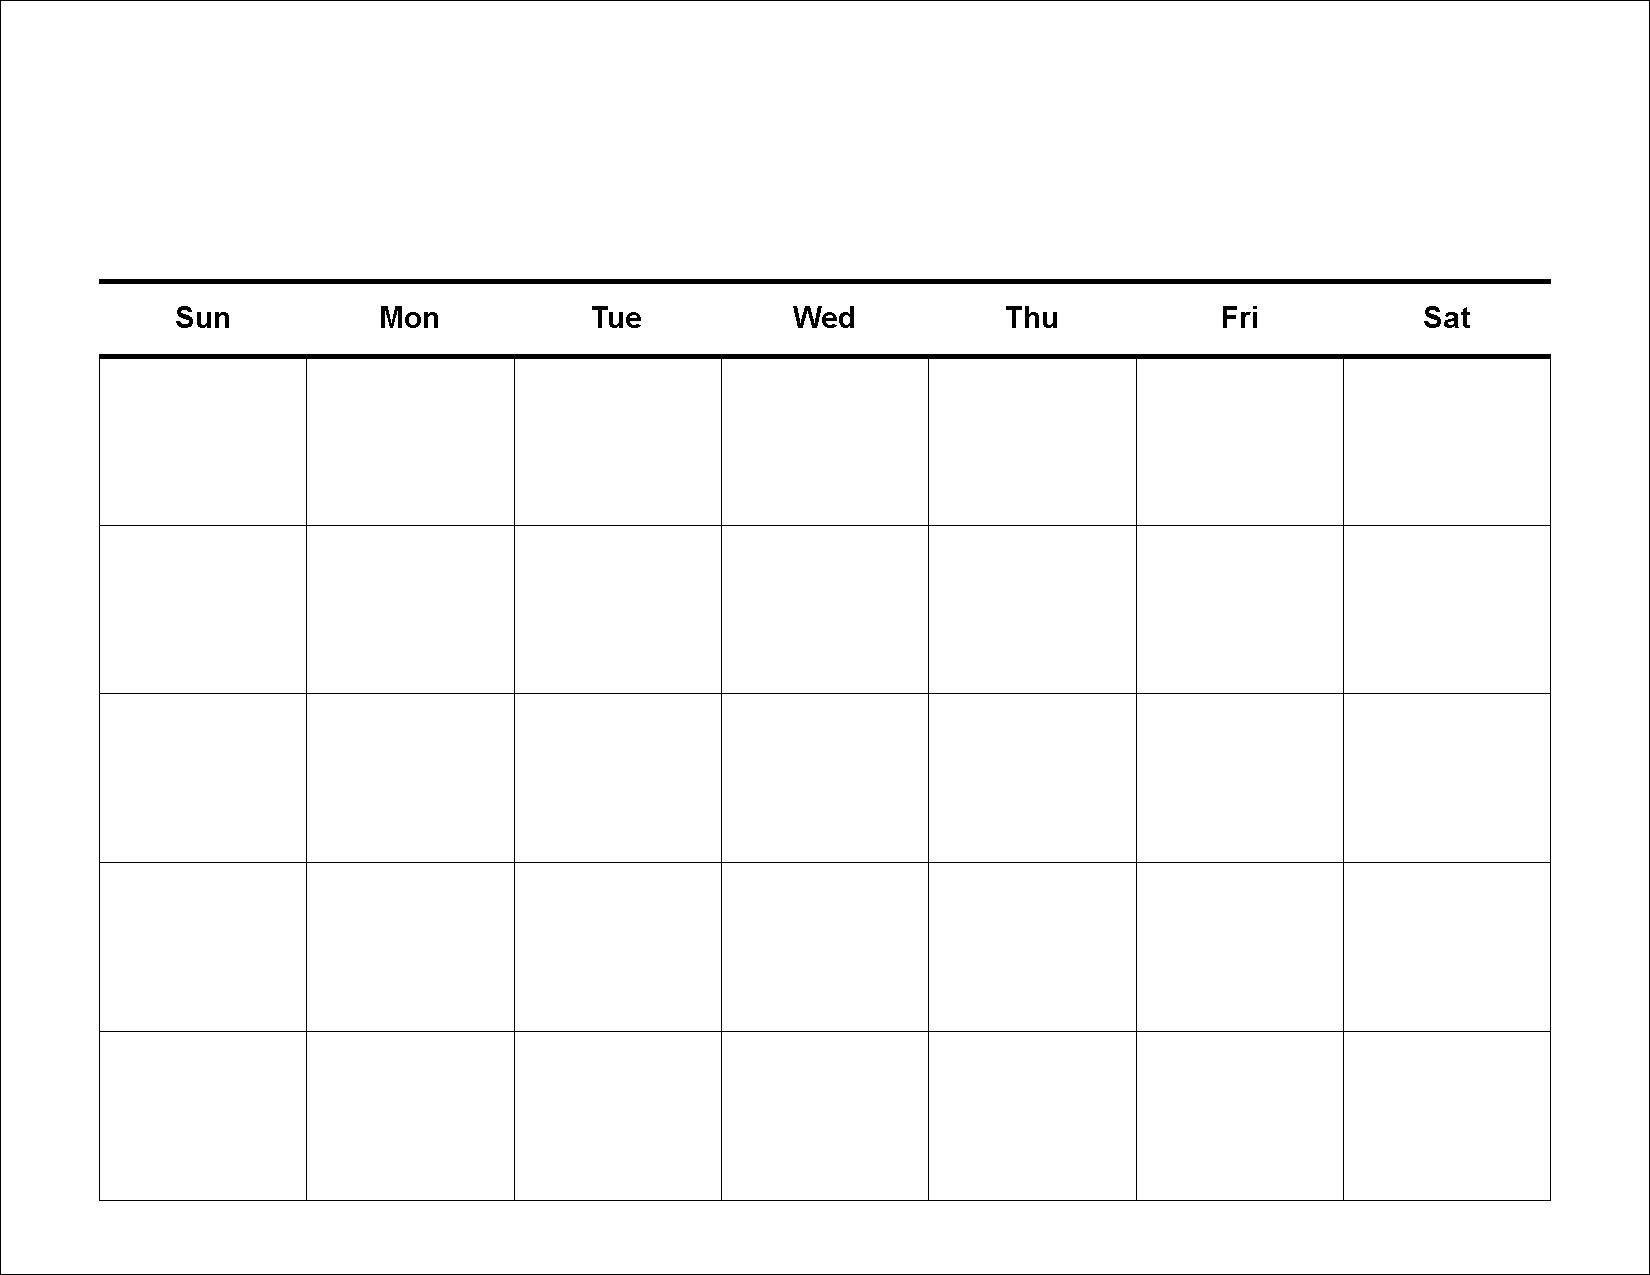 30 Day Blank Calendar Template 2 Week Blank Calendar  Blank 30-Day Calendar